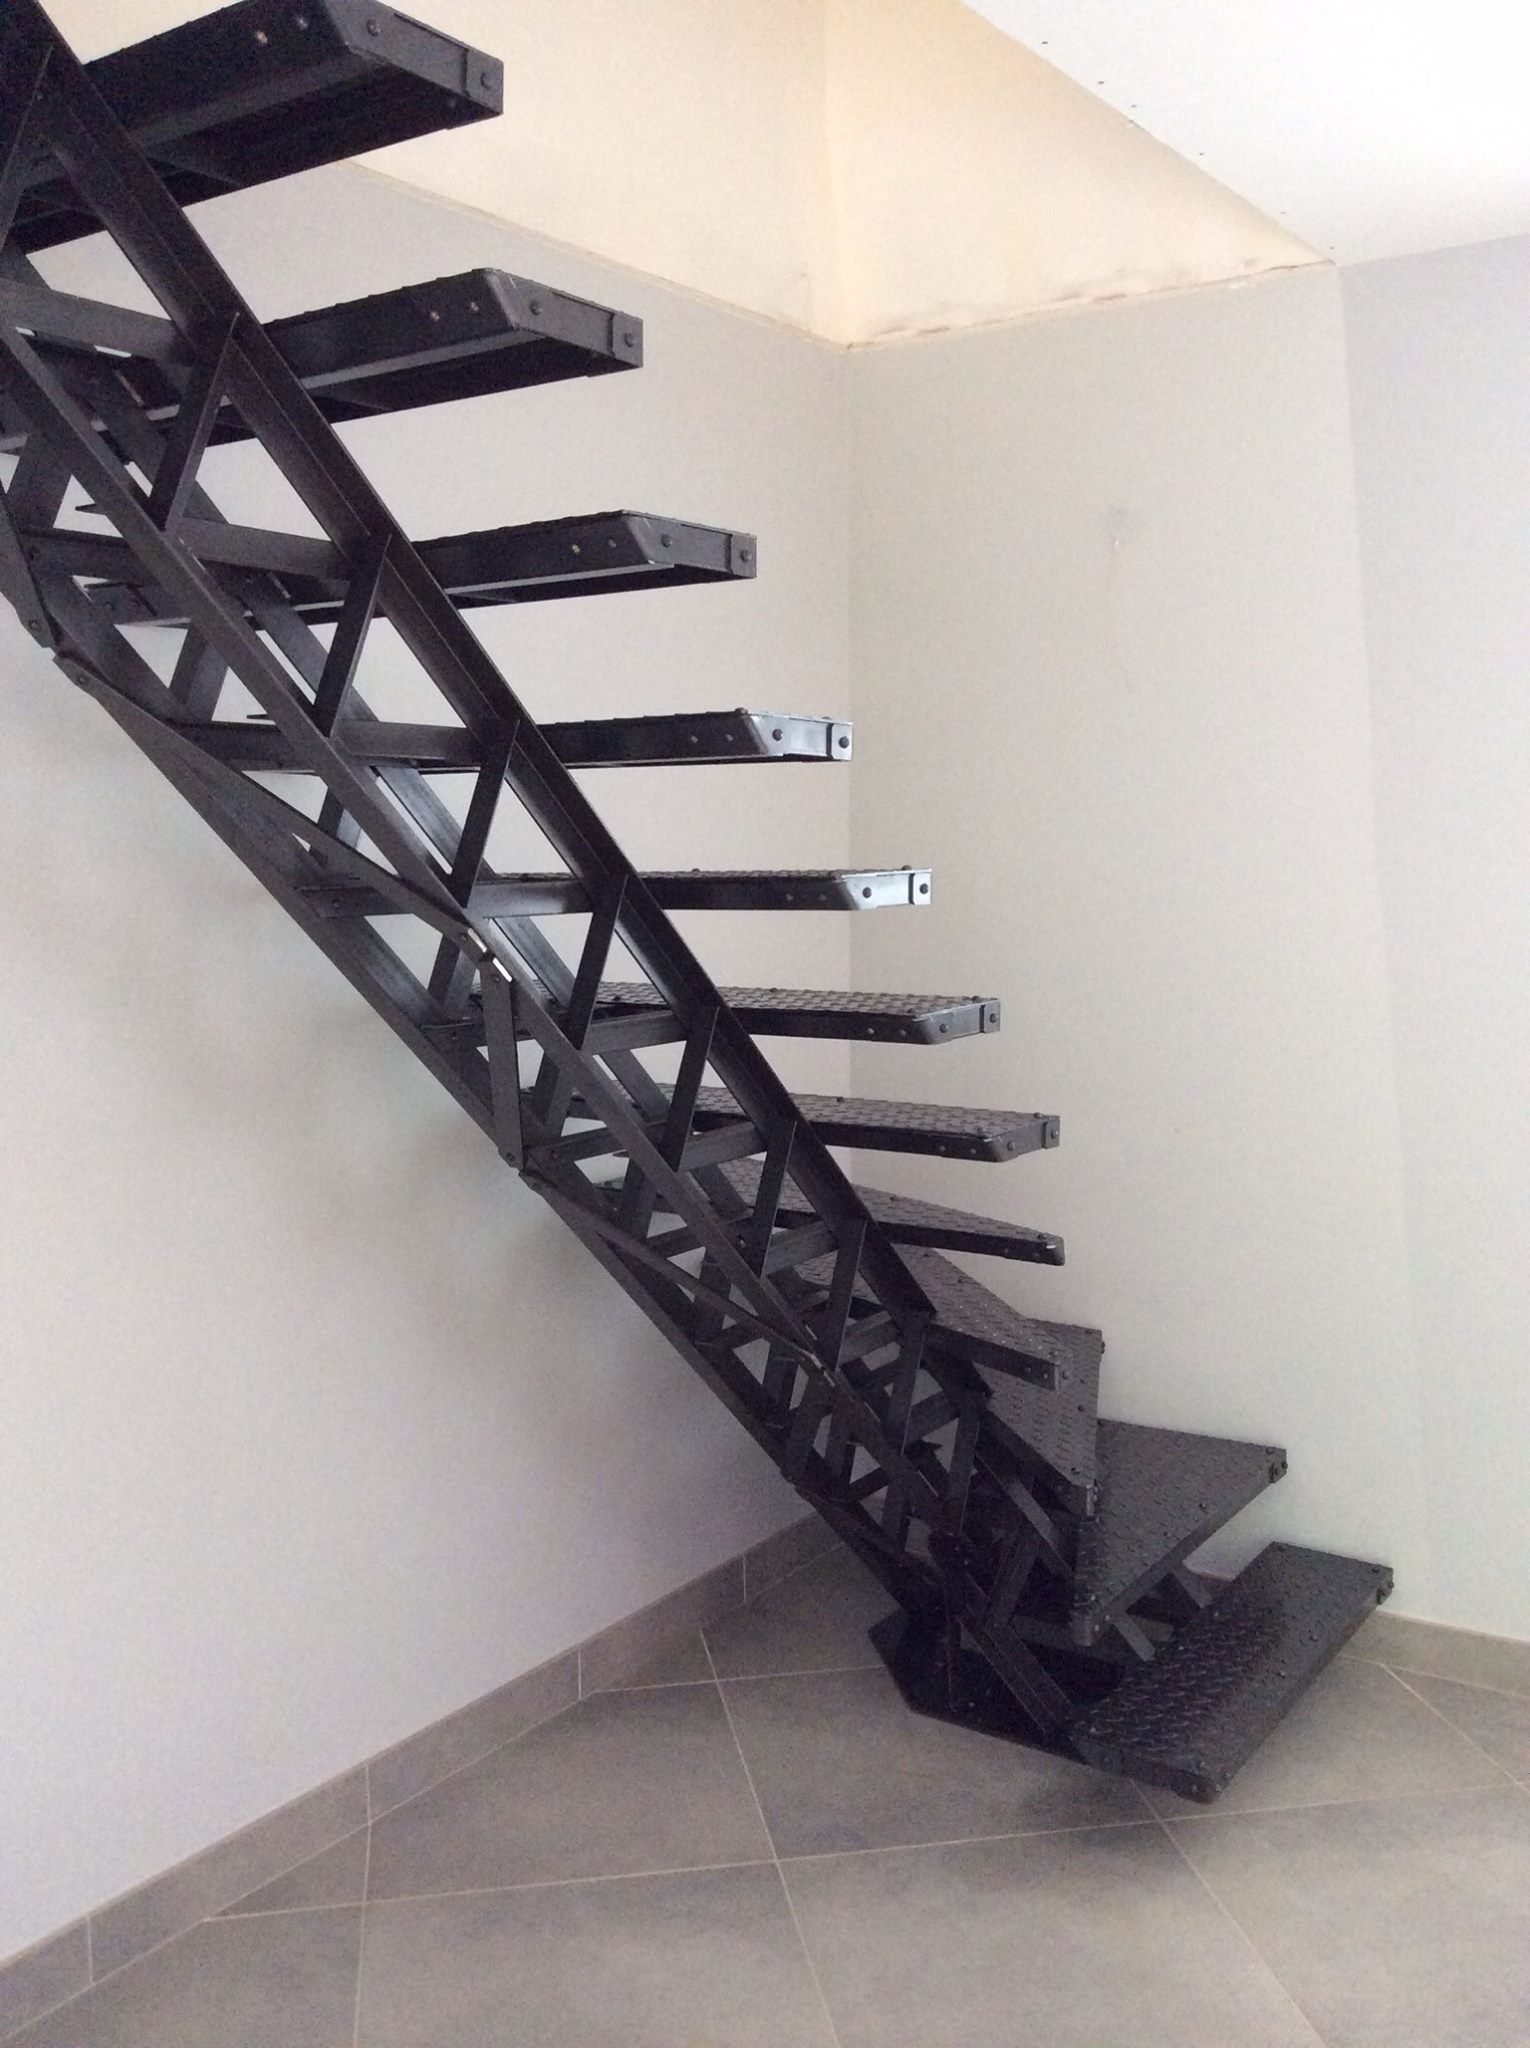 Escalier Type Eiffel Etude Et Fabrication D Un Escalier En